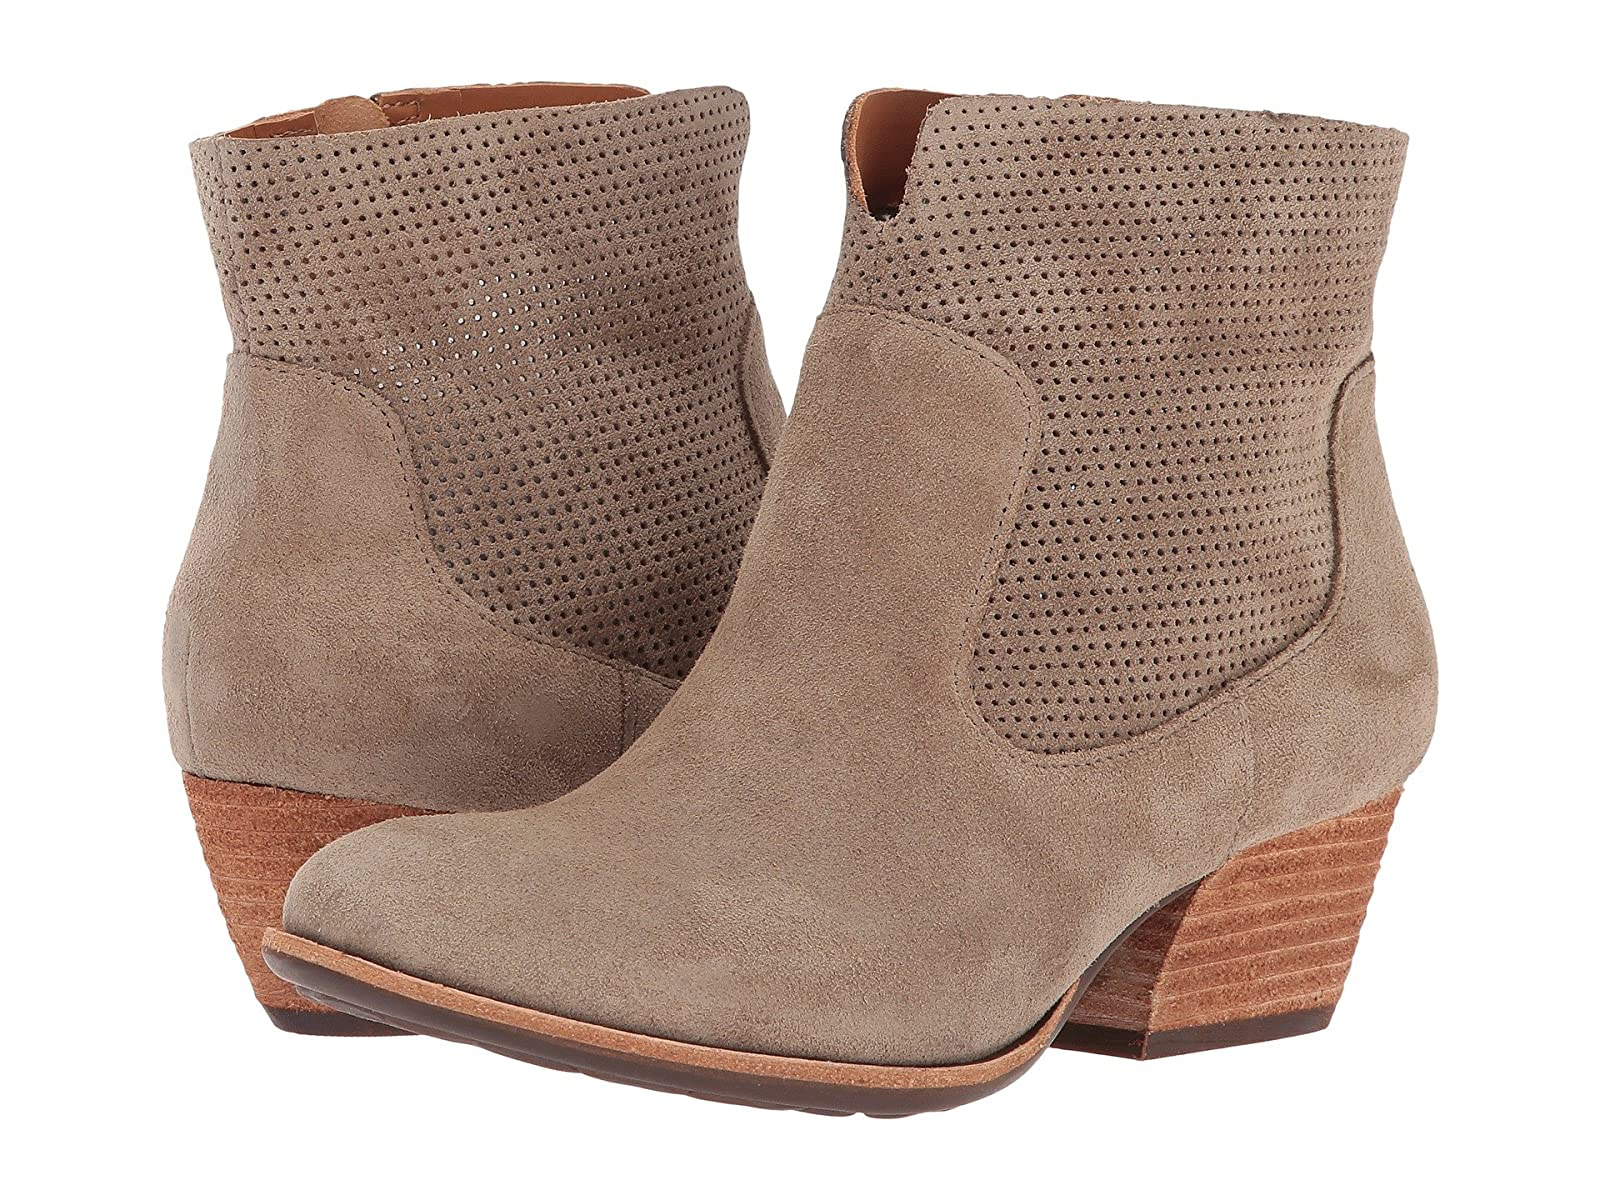 Kork-Ease SherrillCheap and distinctive eye-catching shoes